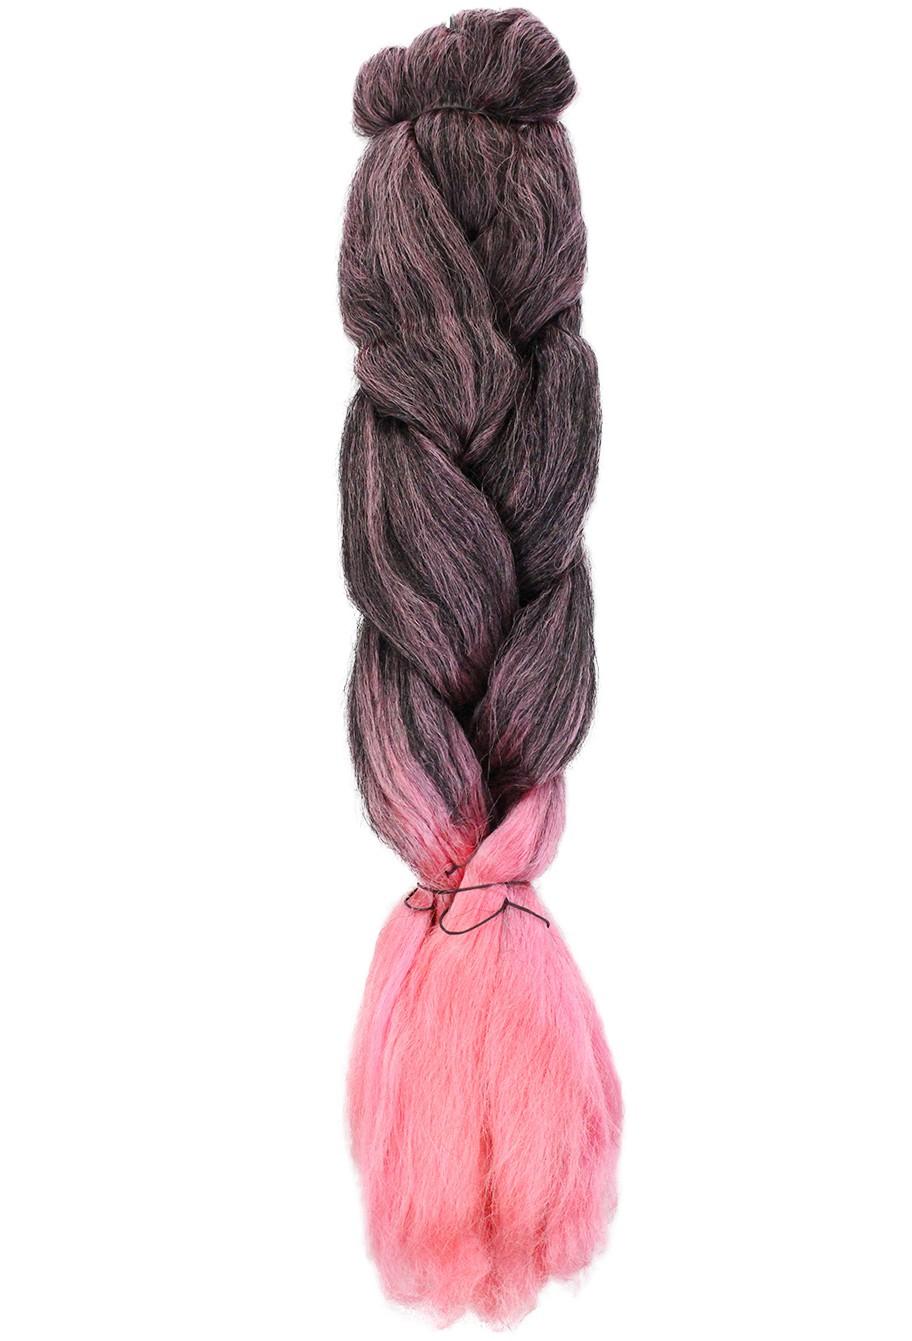 Cabelo Sintético - Ser Mulher - Jumbo (399g) - Cor: Preto com Rosa (T1B/Pink)